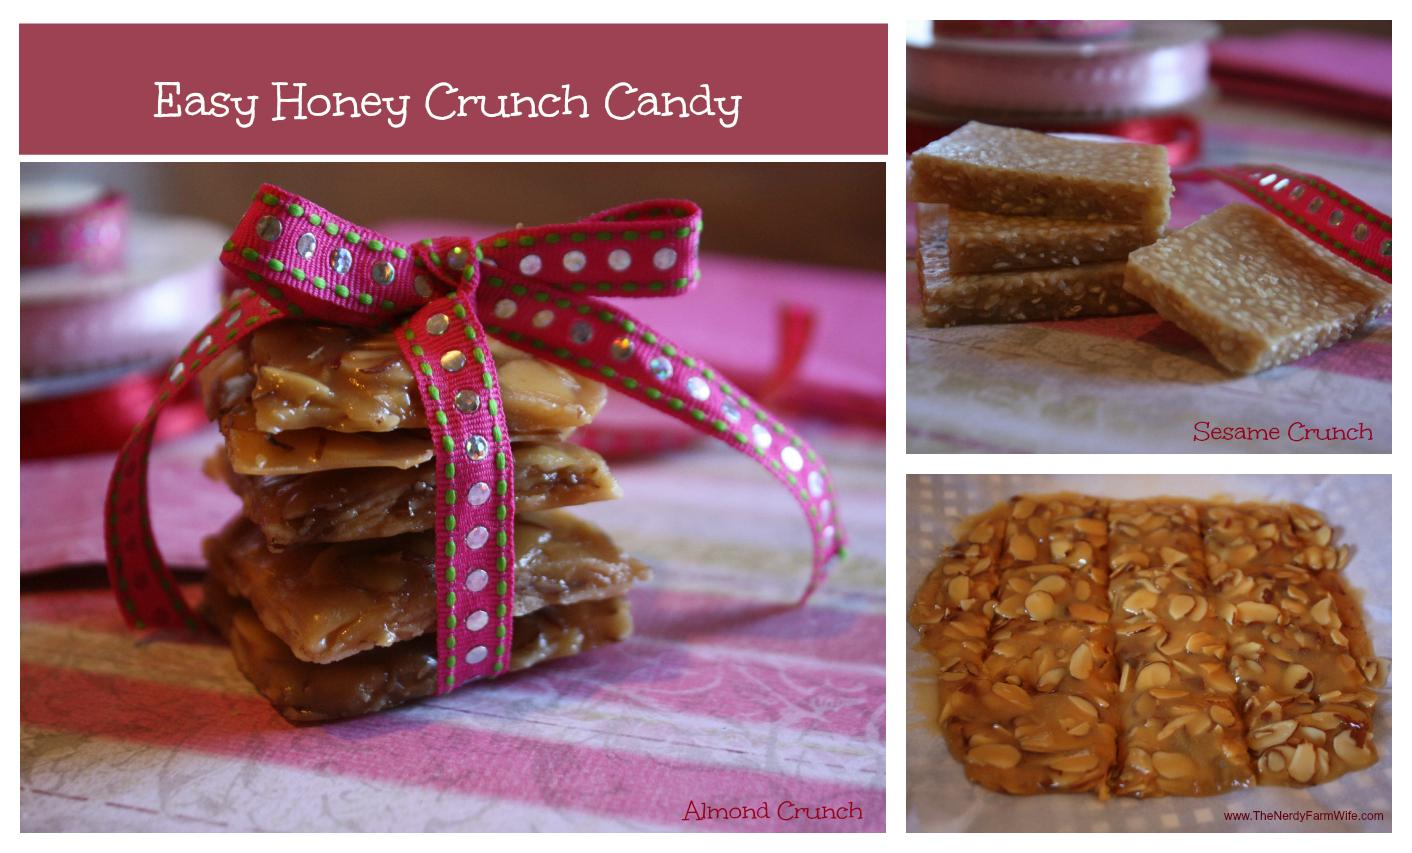 Easy Honey Crunch Candy Recipe